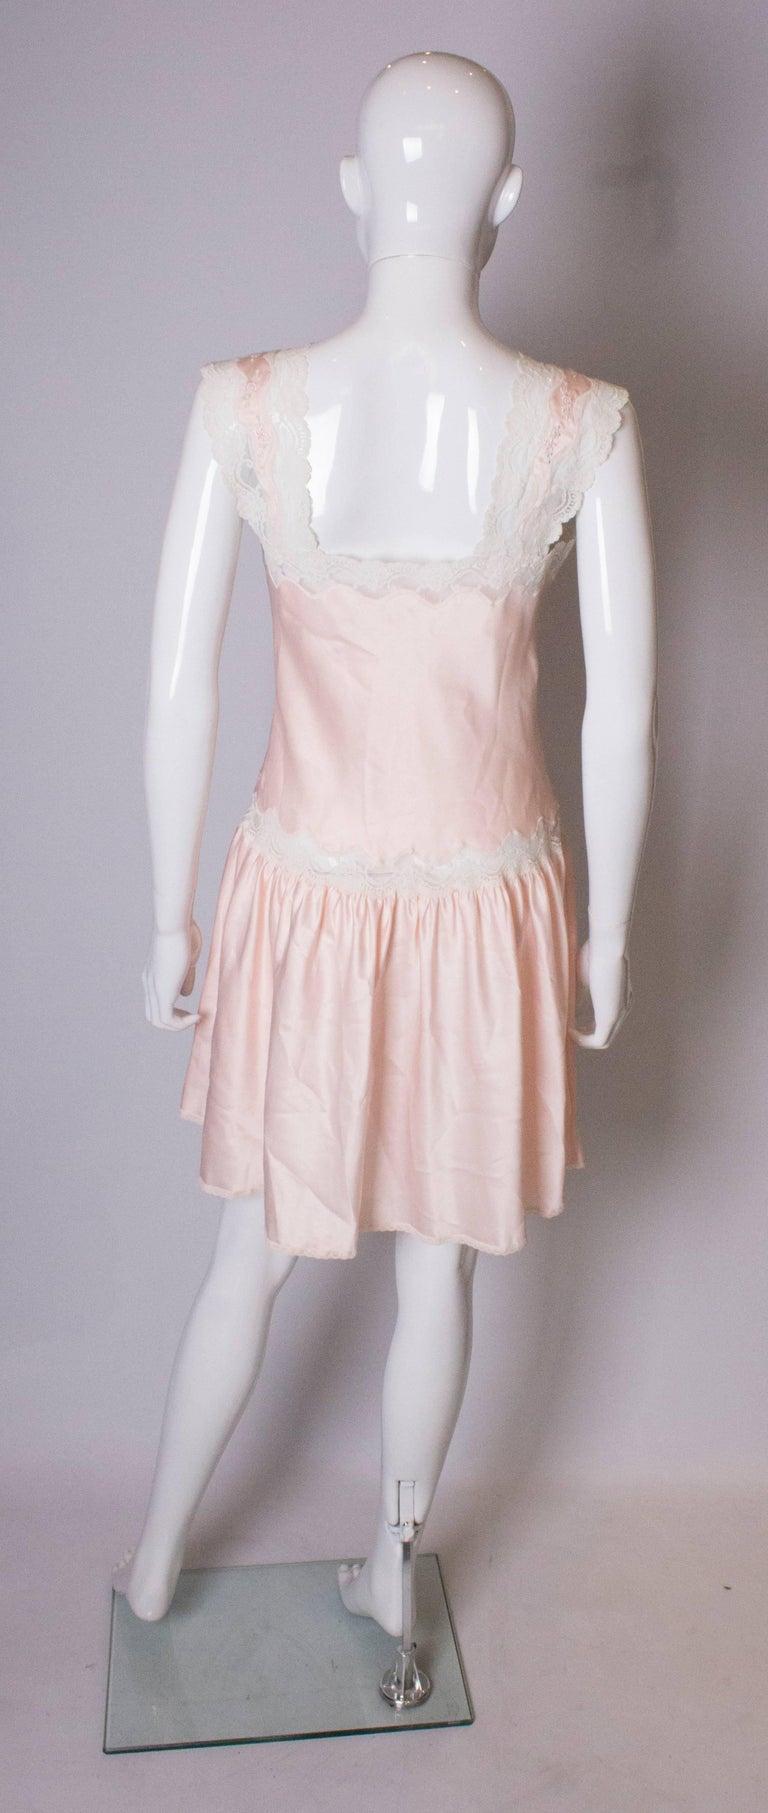 Vintage Pink Nightdress or Dress For Sale 2